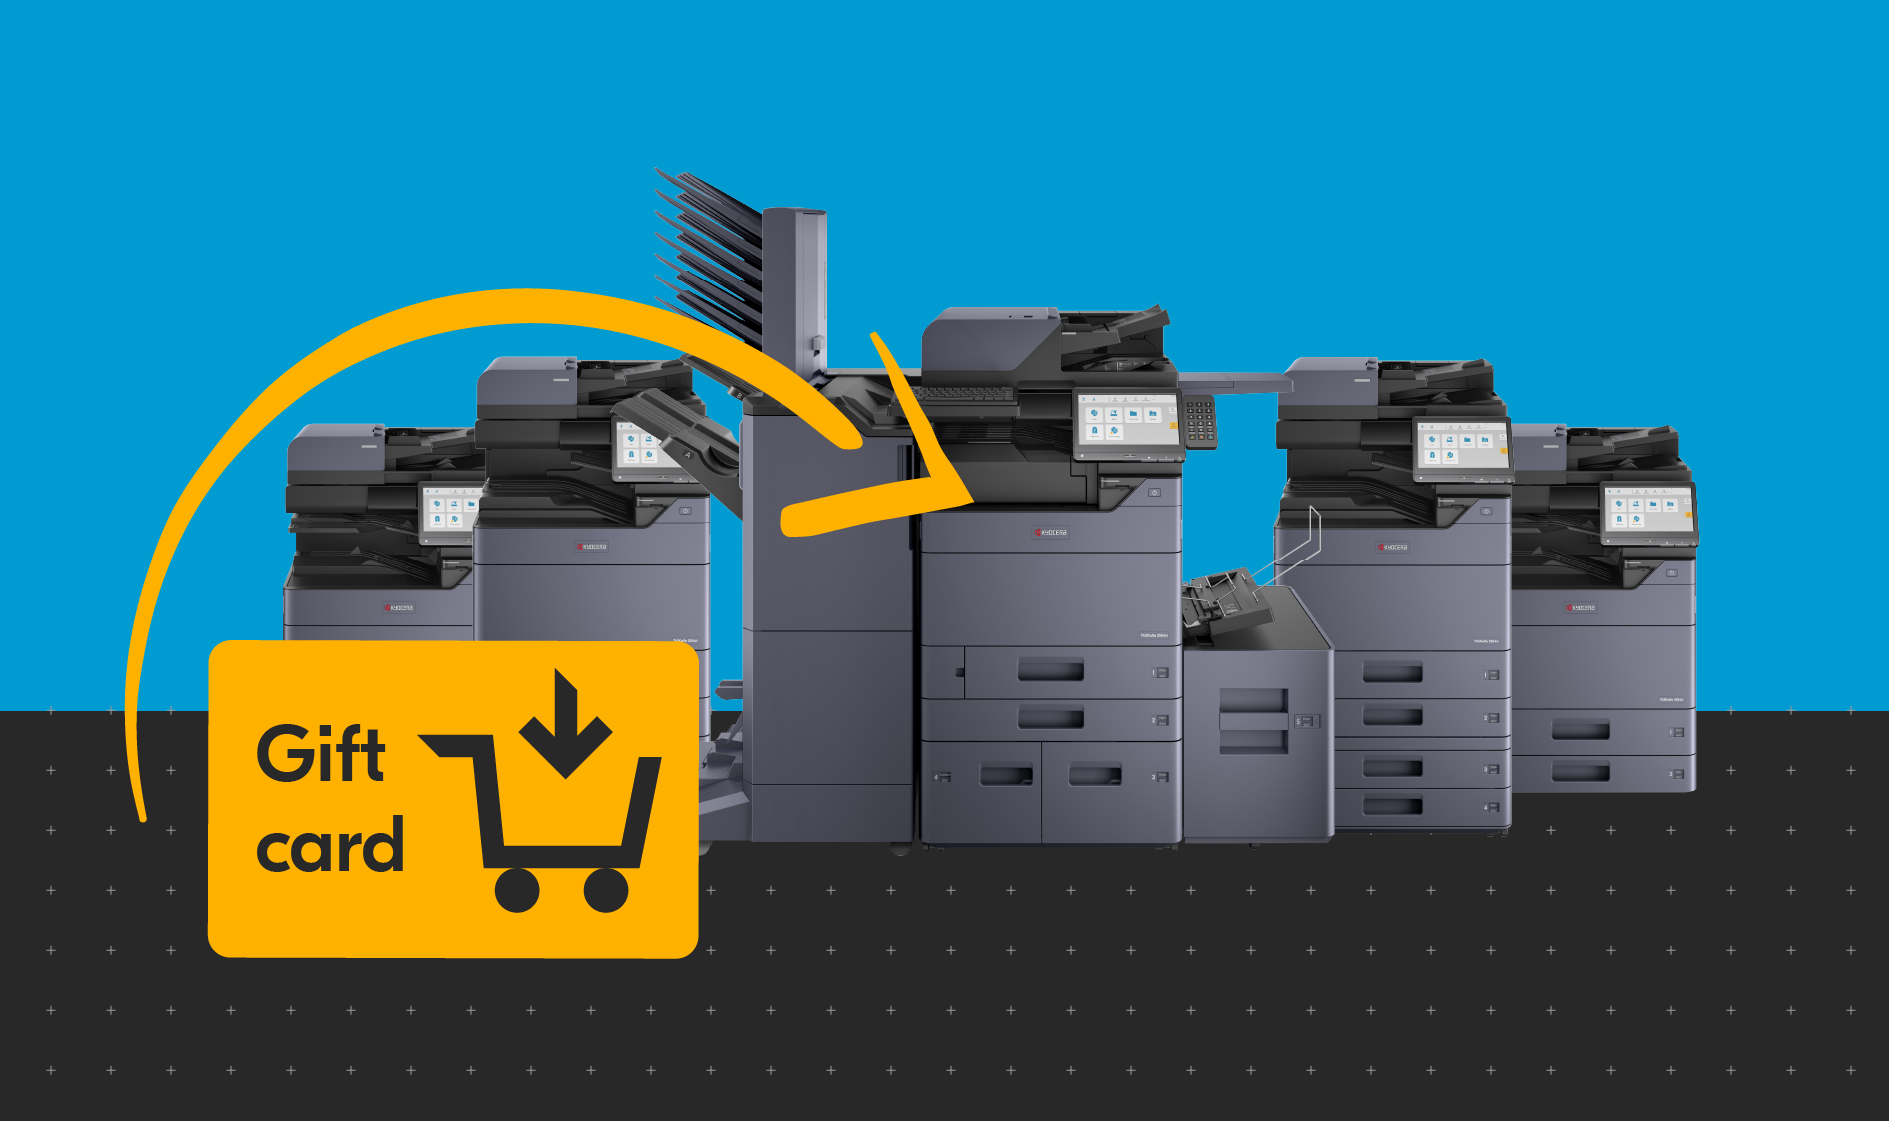 Kyocera TASKalfa Multifunction Printer Offer